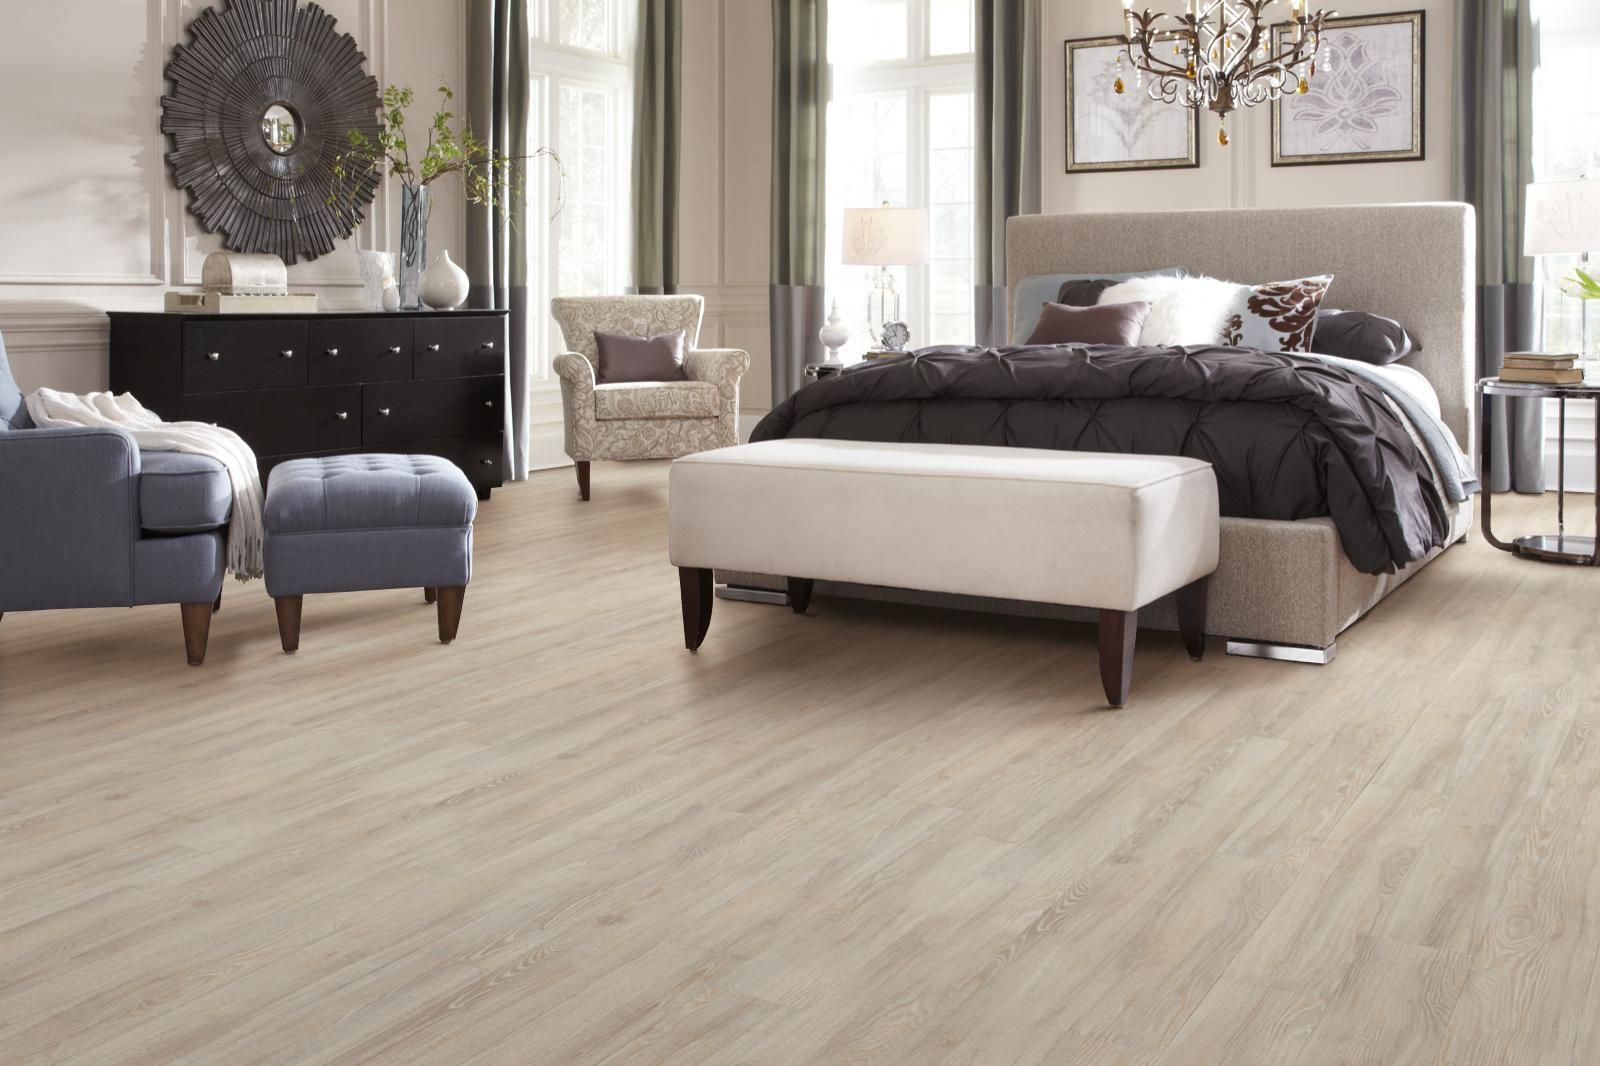 I used the Mannington Virtual Decorator House flooring